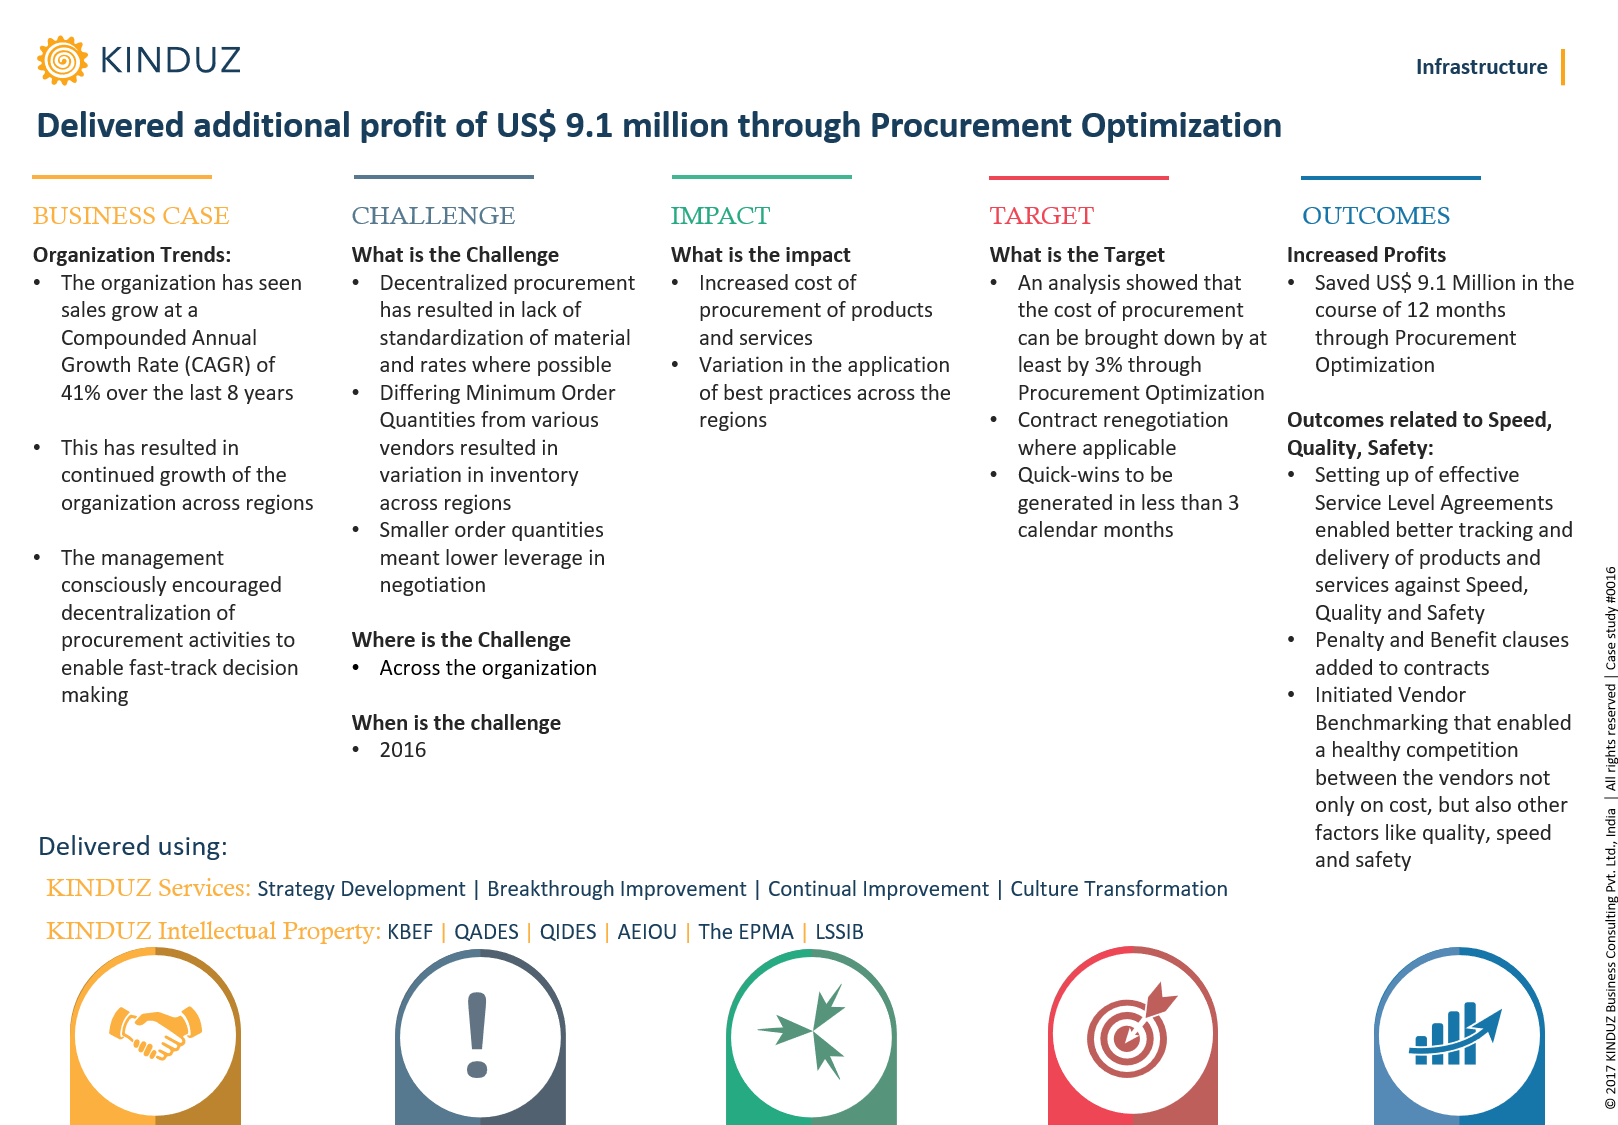 delivered-additional-profit-of-us-9-1-million-through-procurement-optimization